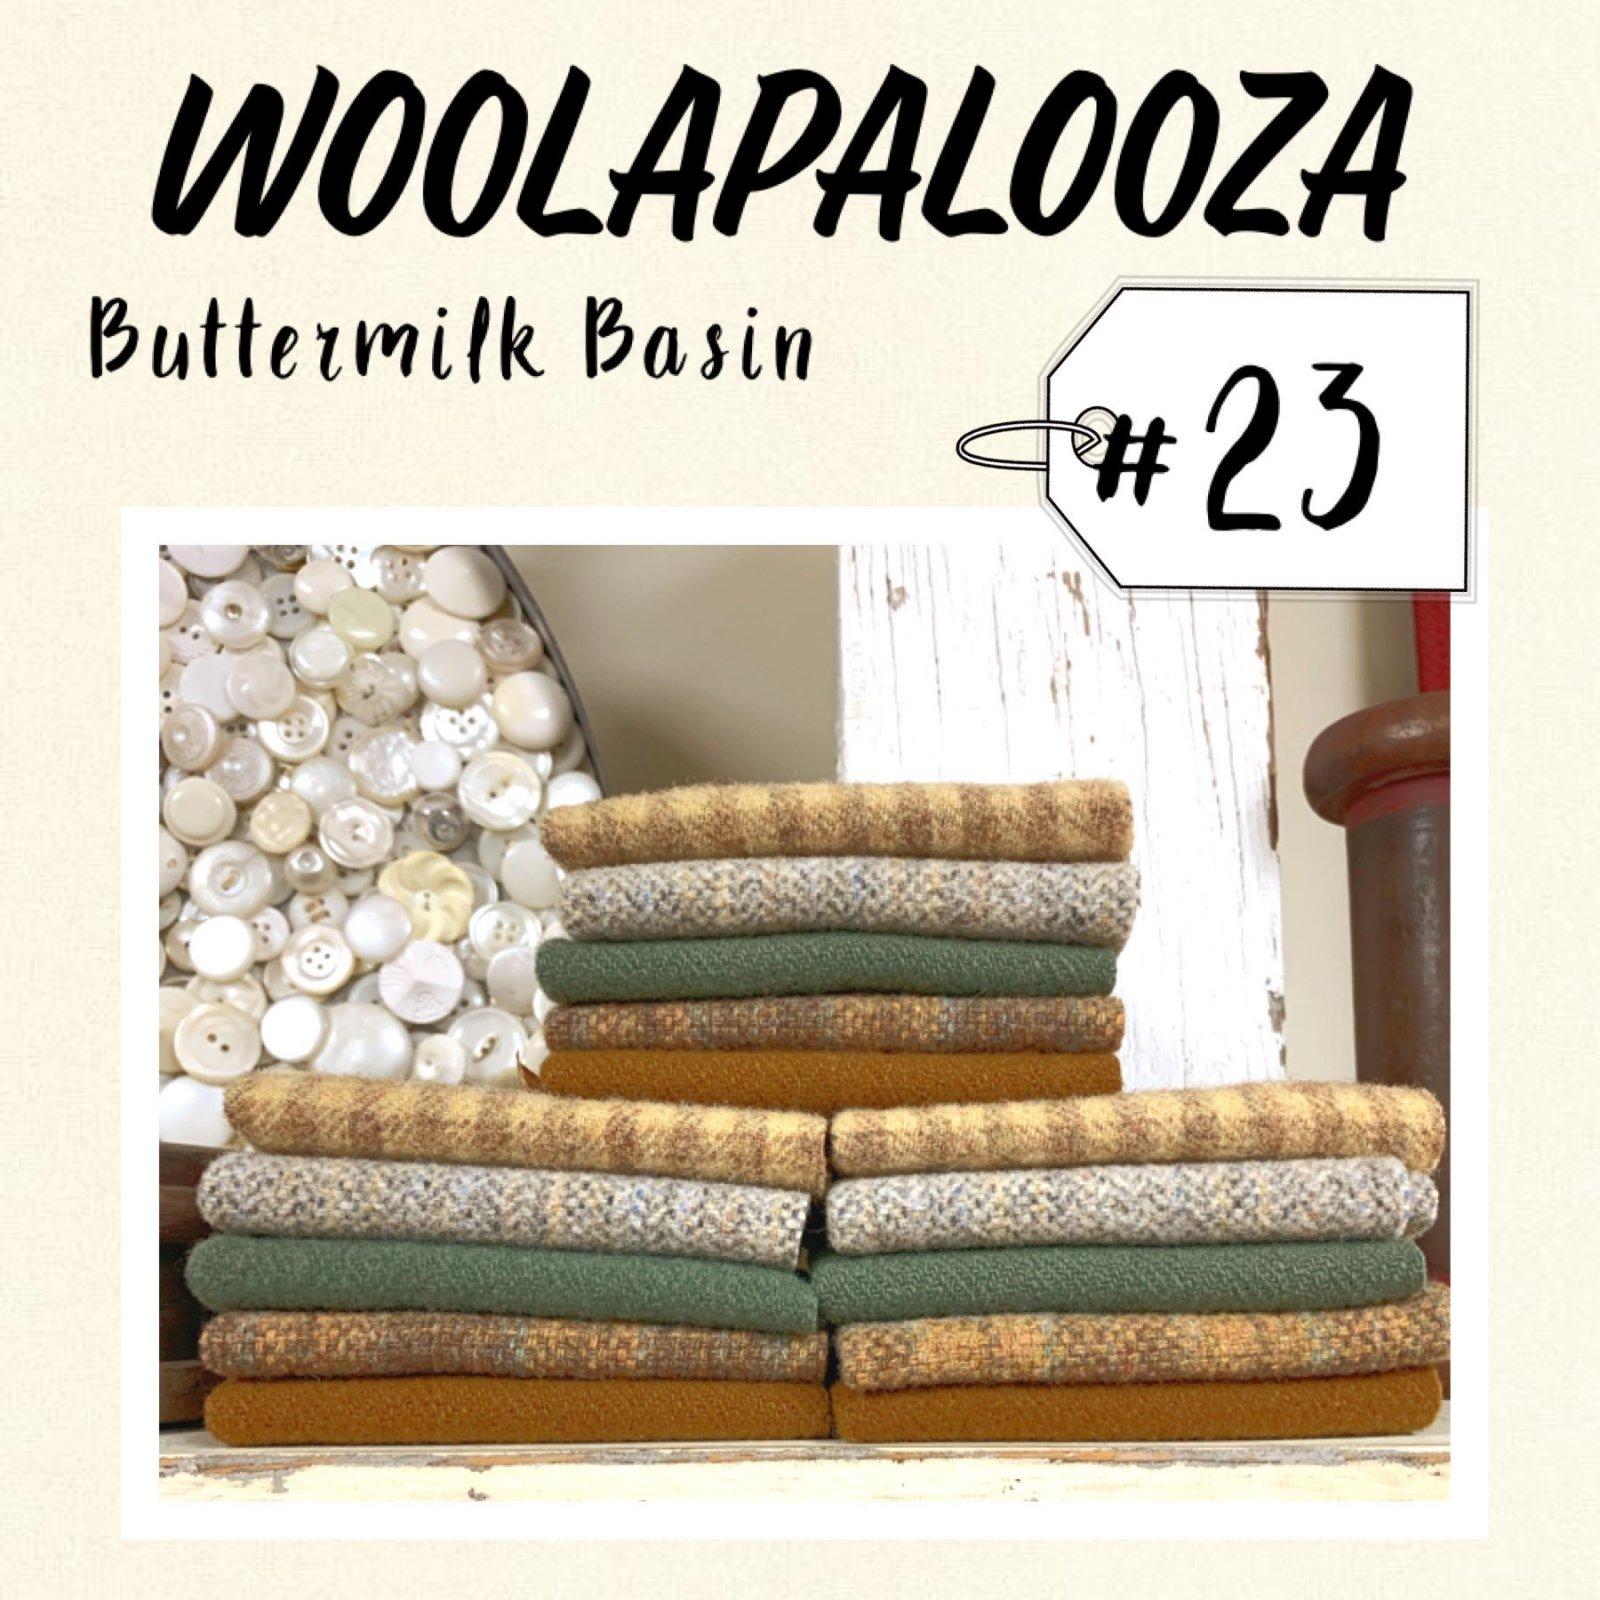 Woolapalooza #23 Wool Bundle